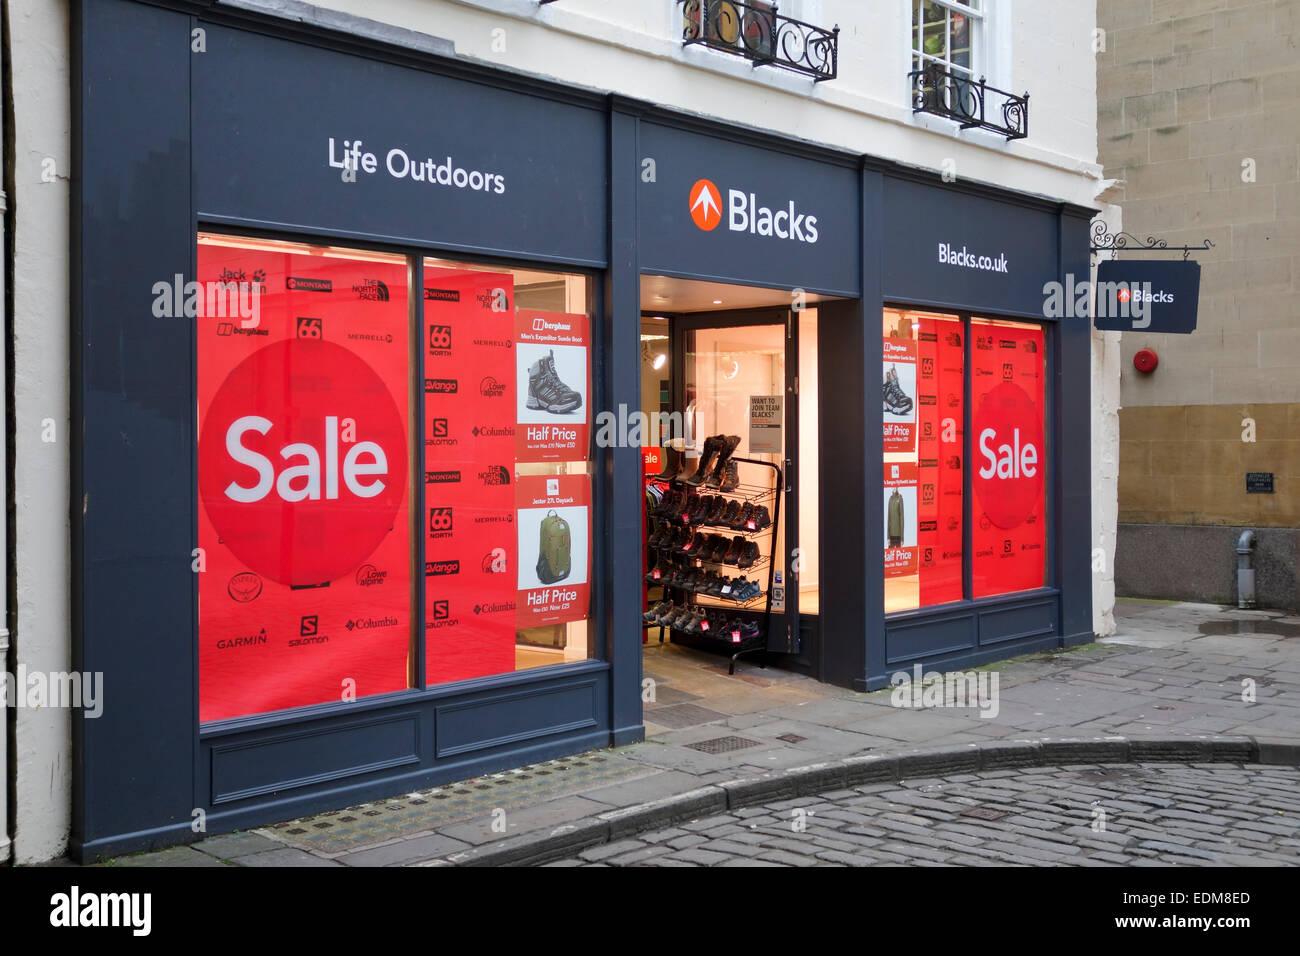 Blacks Outdoor Retailer, Bath, Angleterre Photo Stock